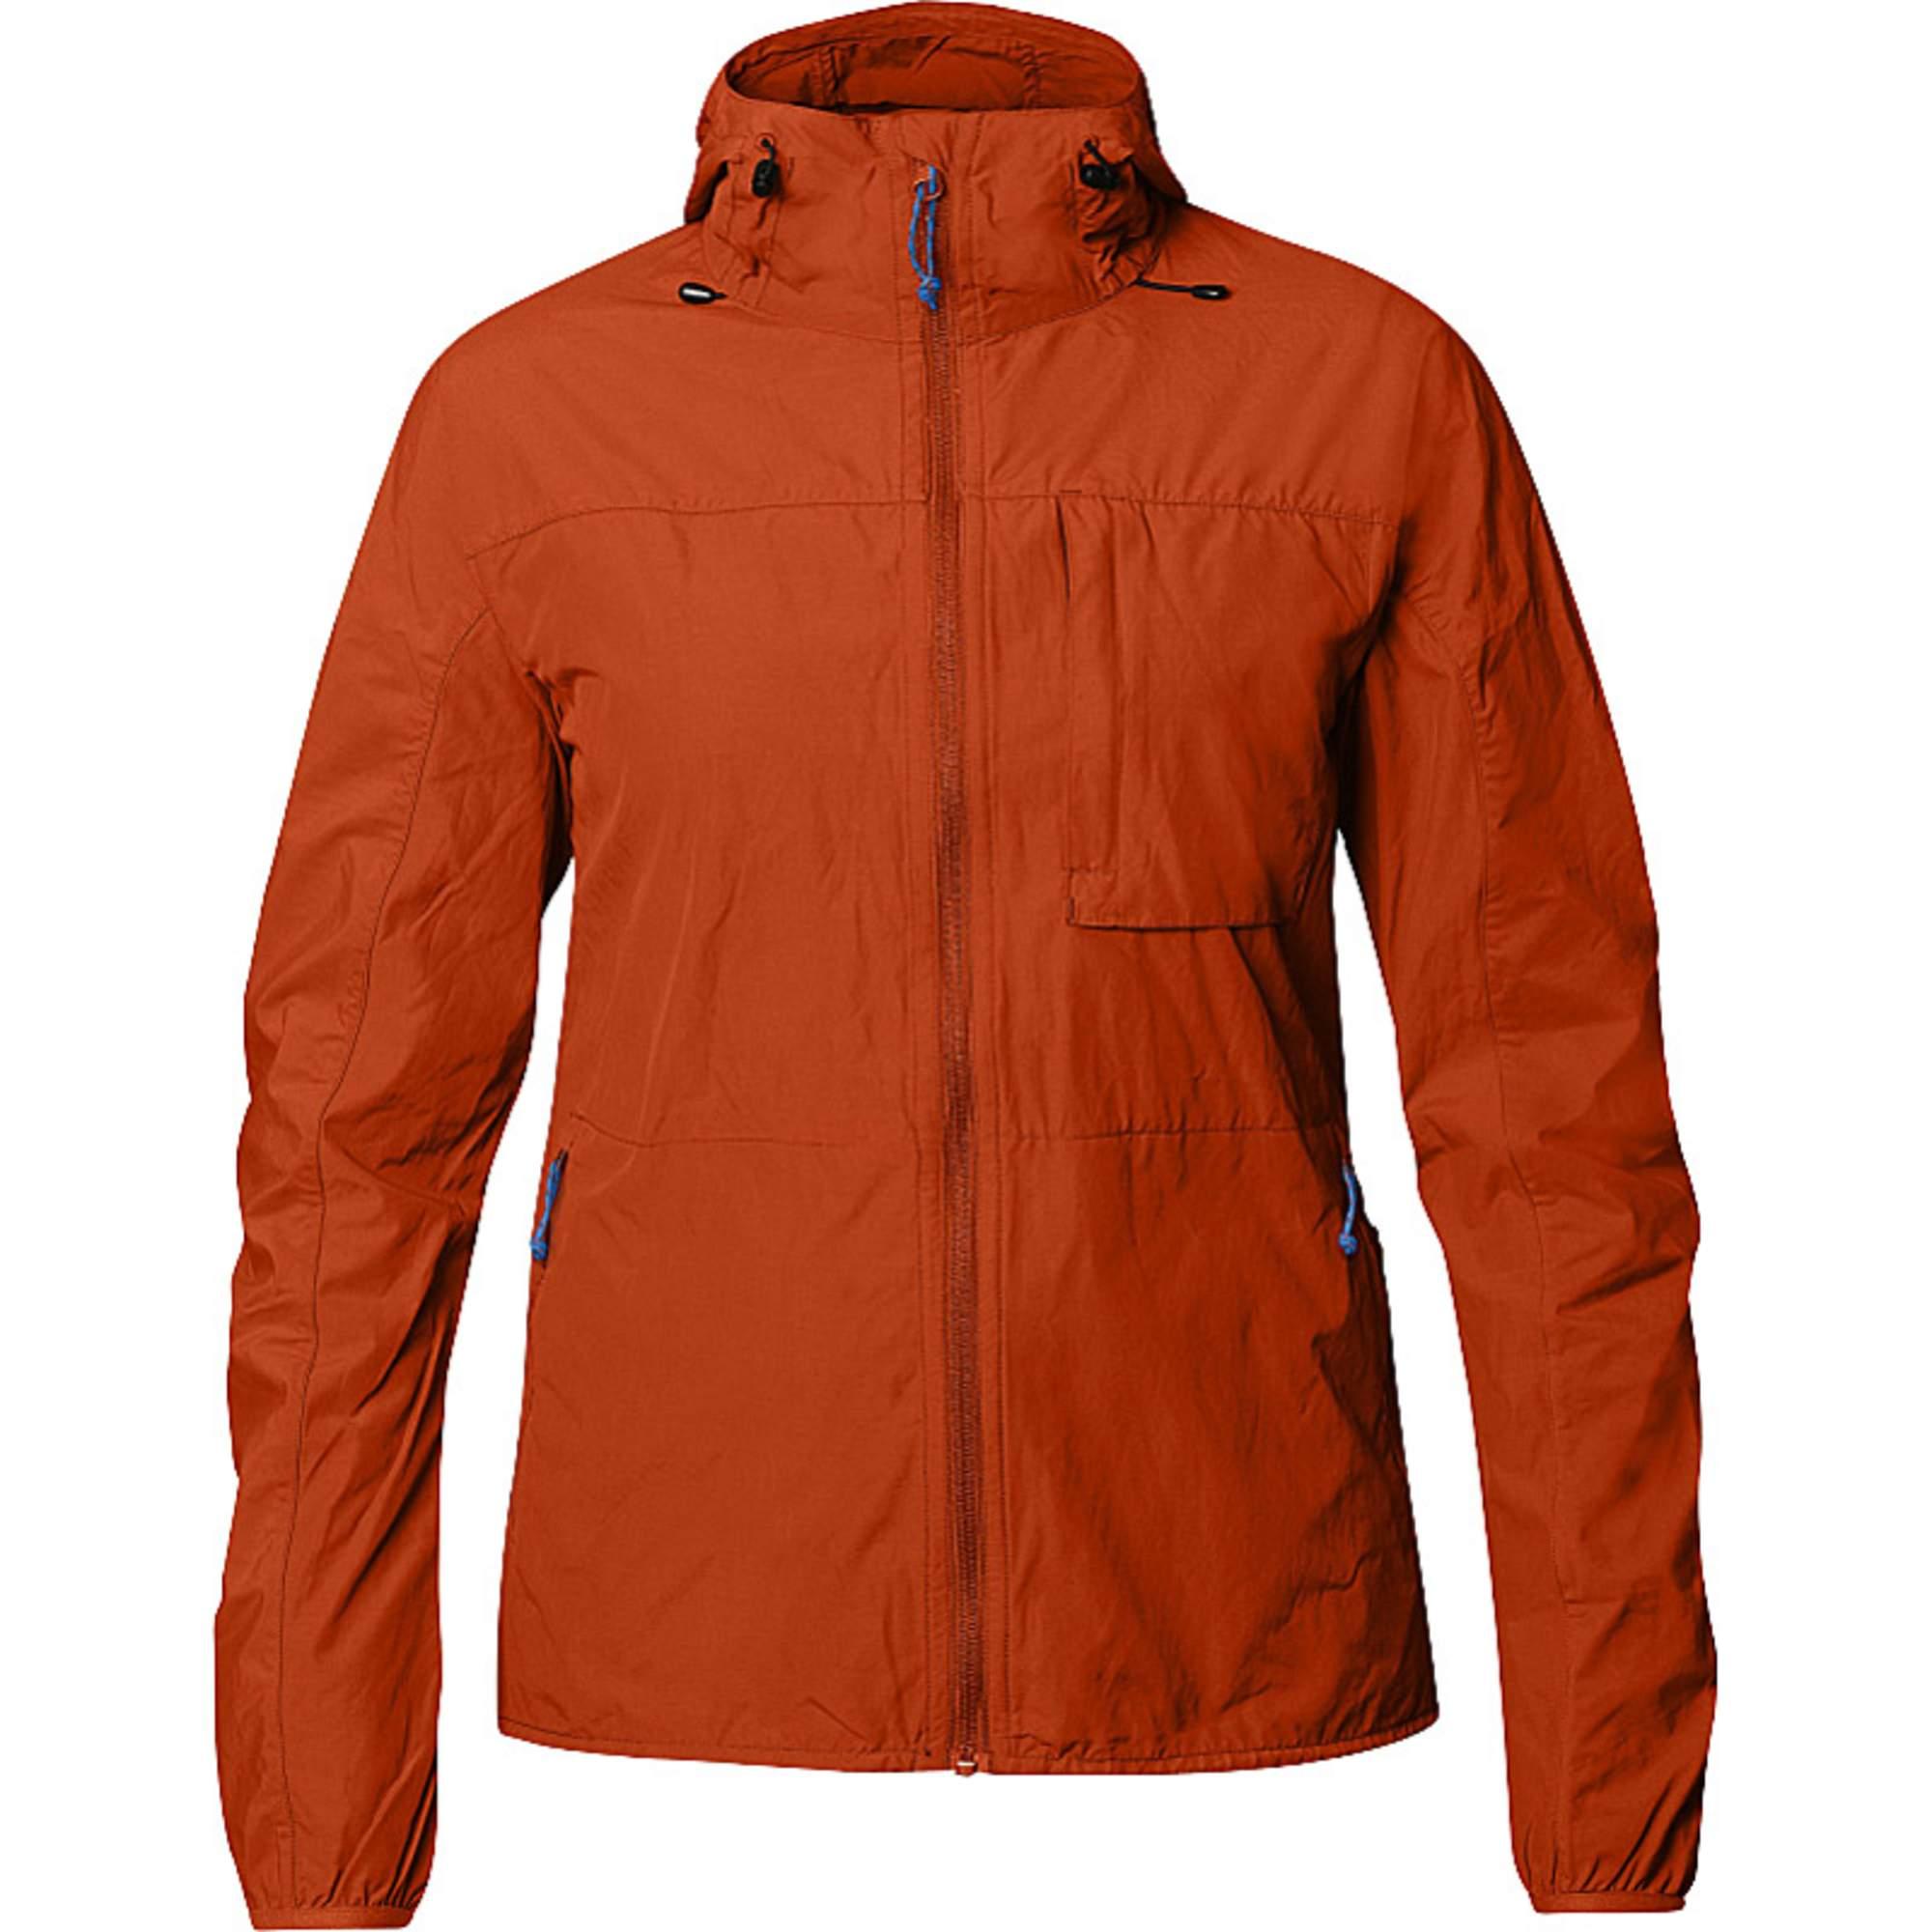 Fjällräven High Coast Wind Jacket Frauen Gr. XL - Übergangsjacke - rotbraun